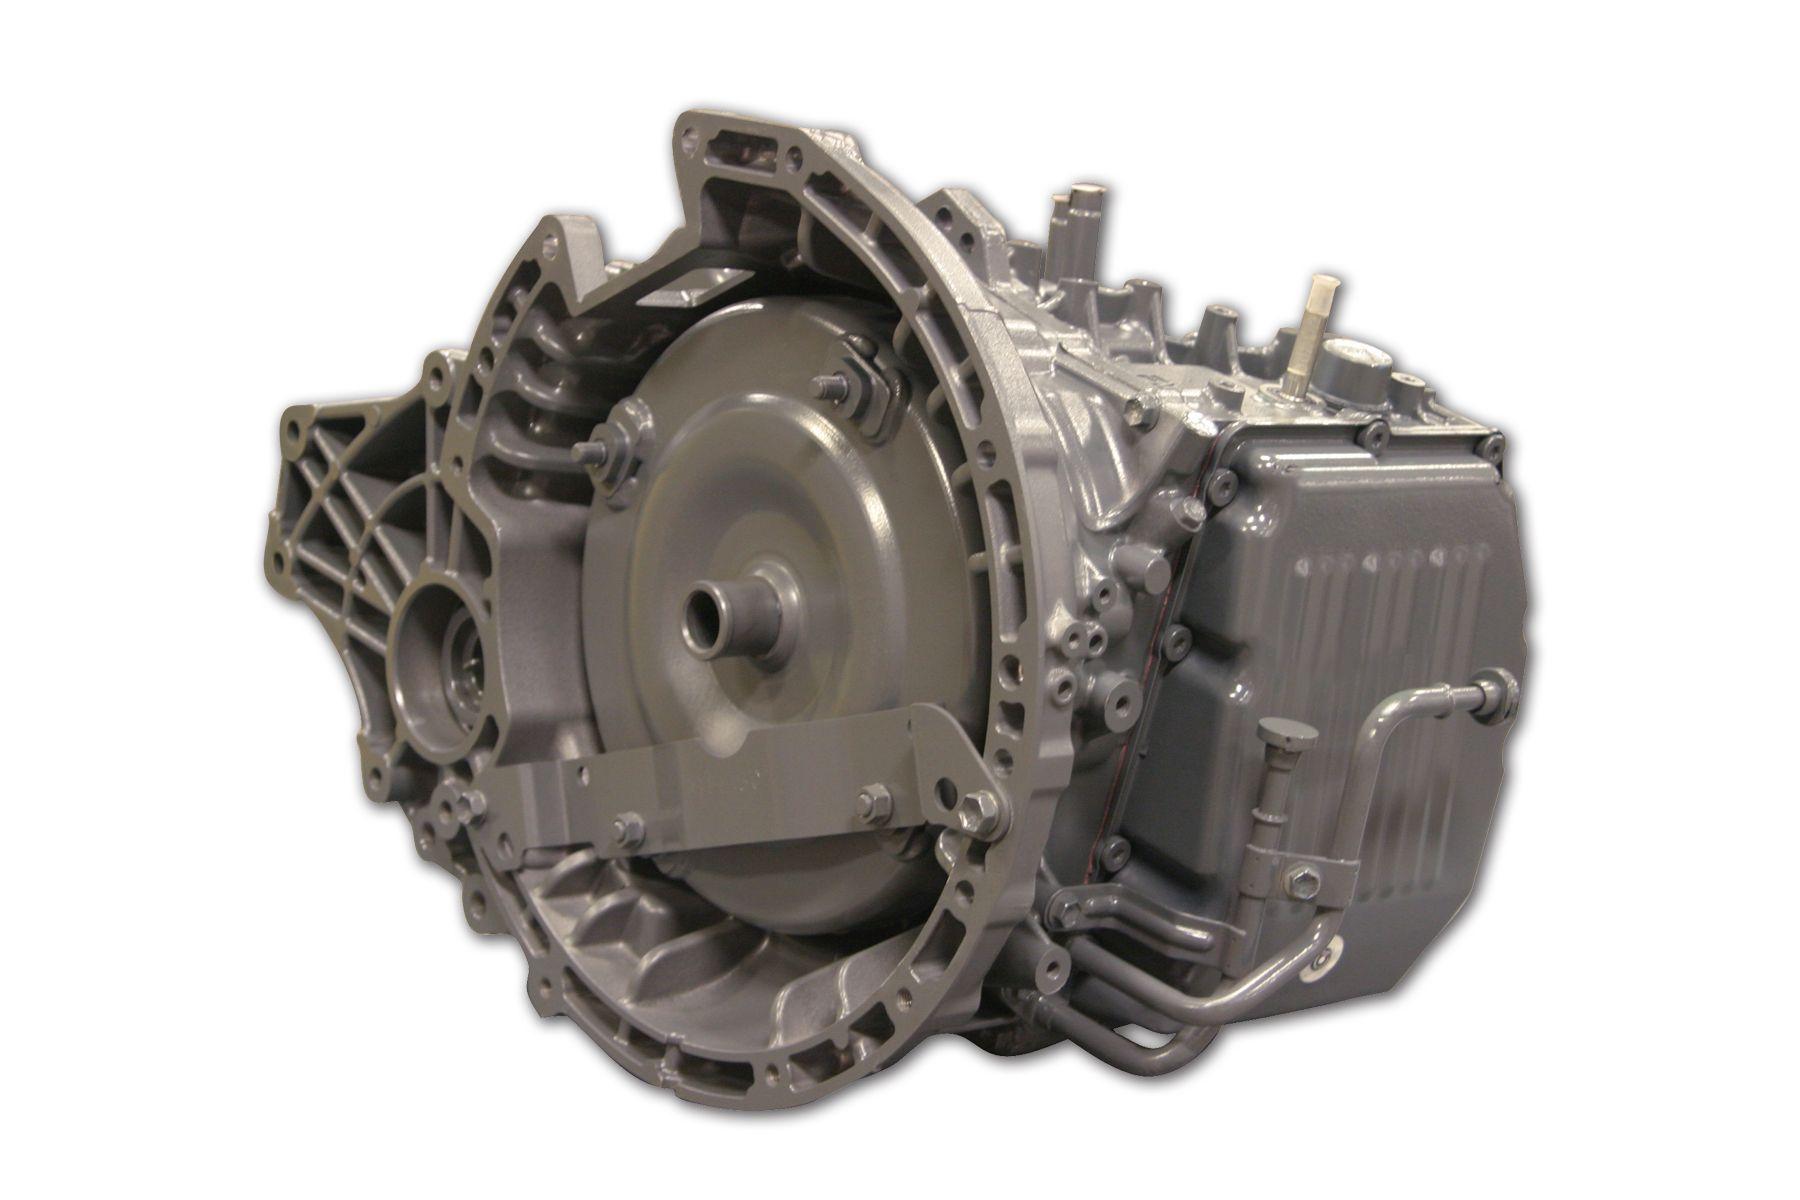 Ford Fusion Upgrades >> Ford/Aisin AF21 Transmission - Maintenance - Work Truck Online